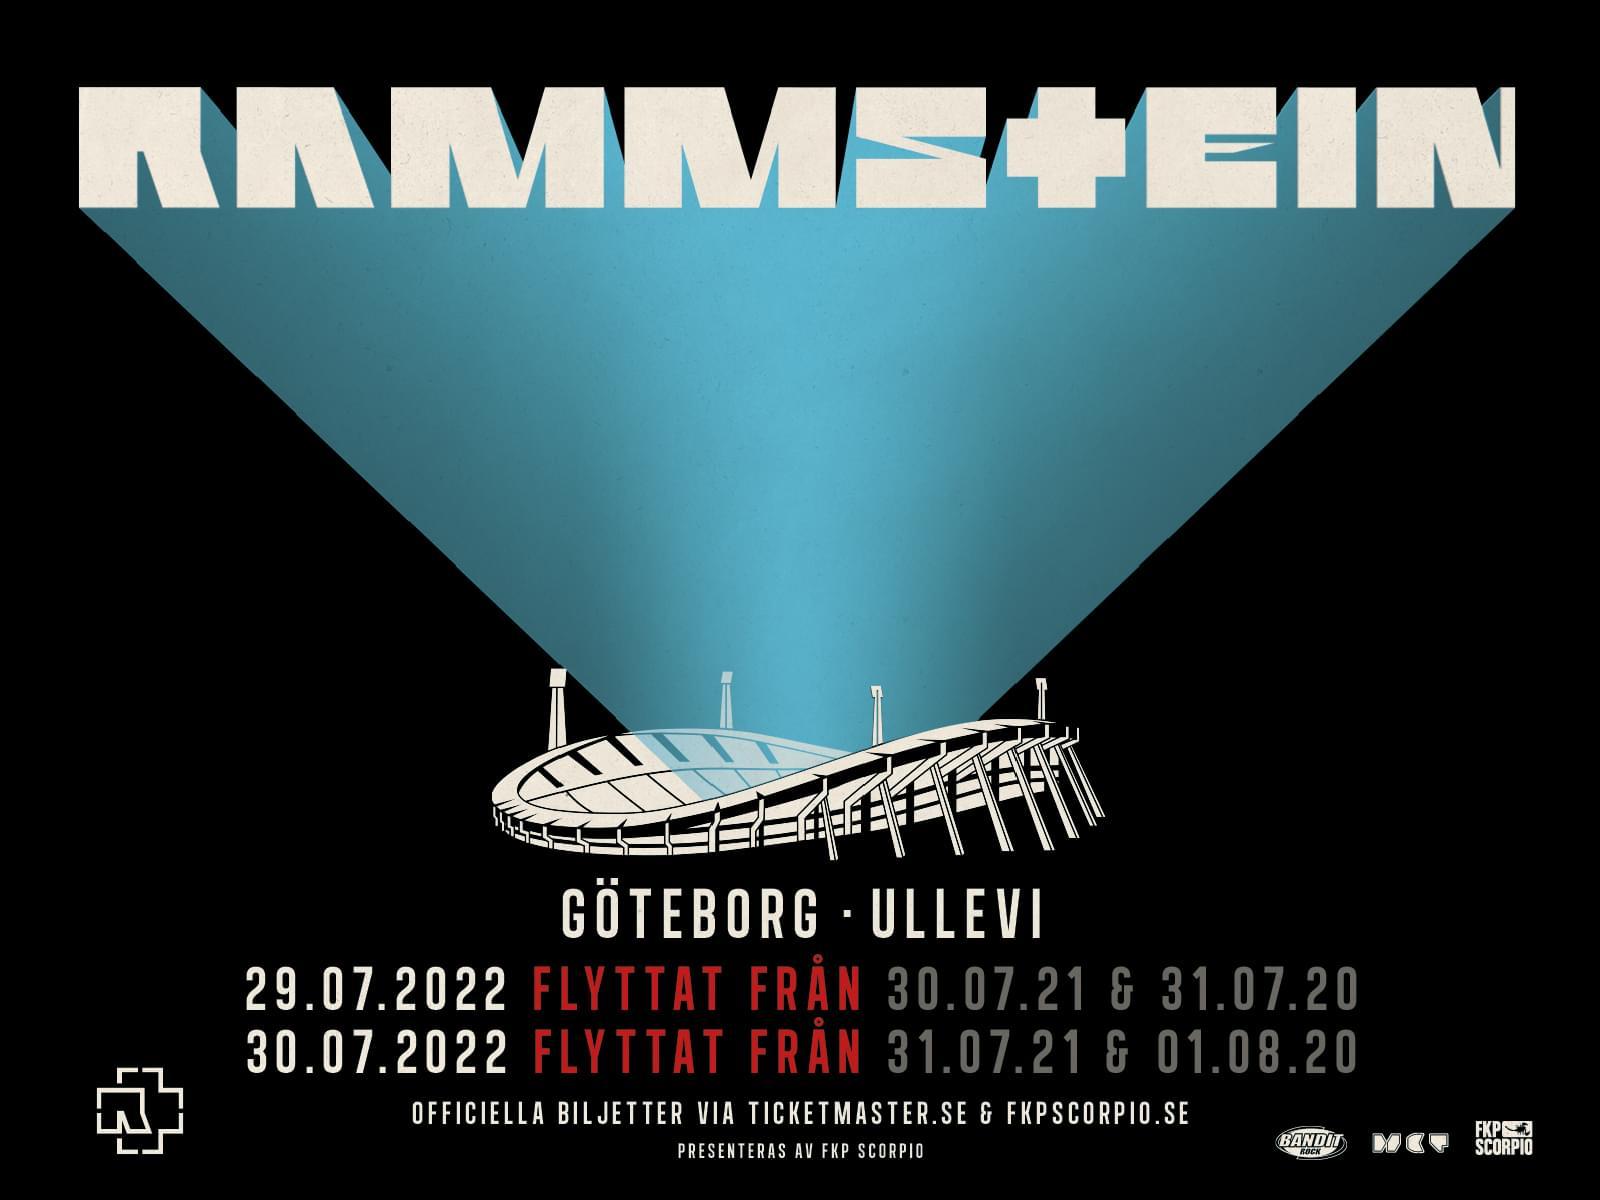 Rammstein.